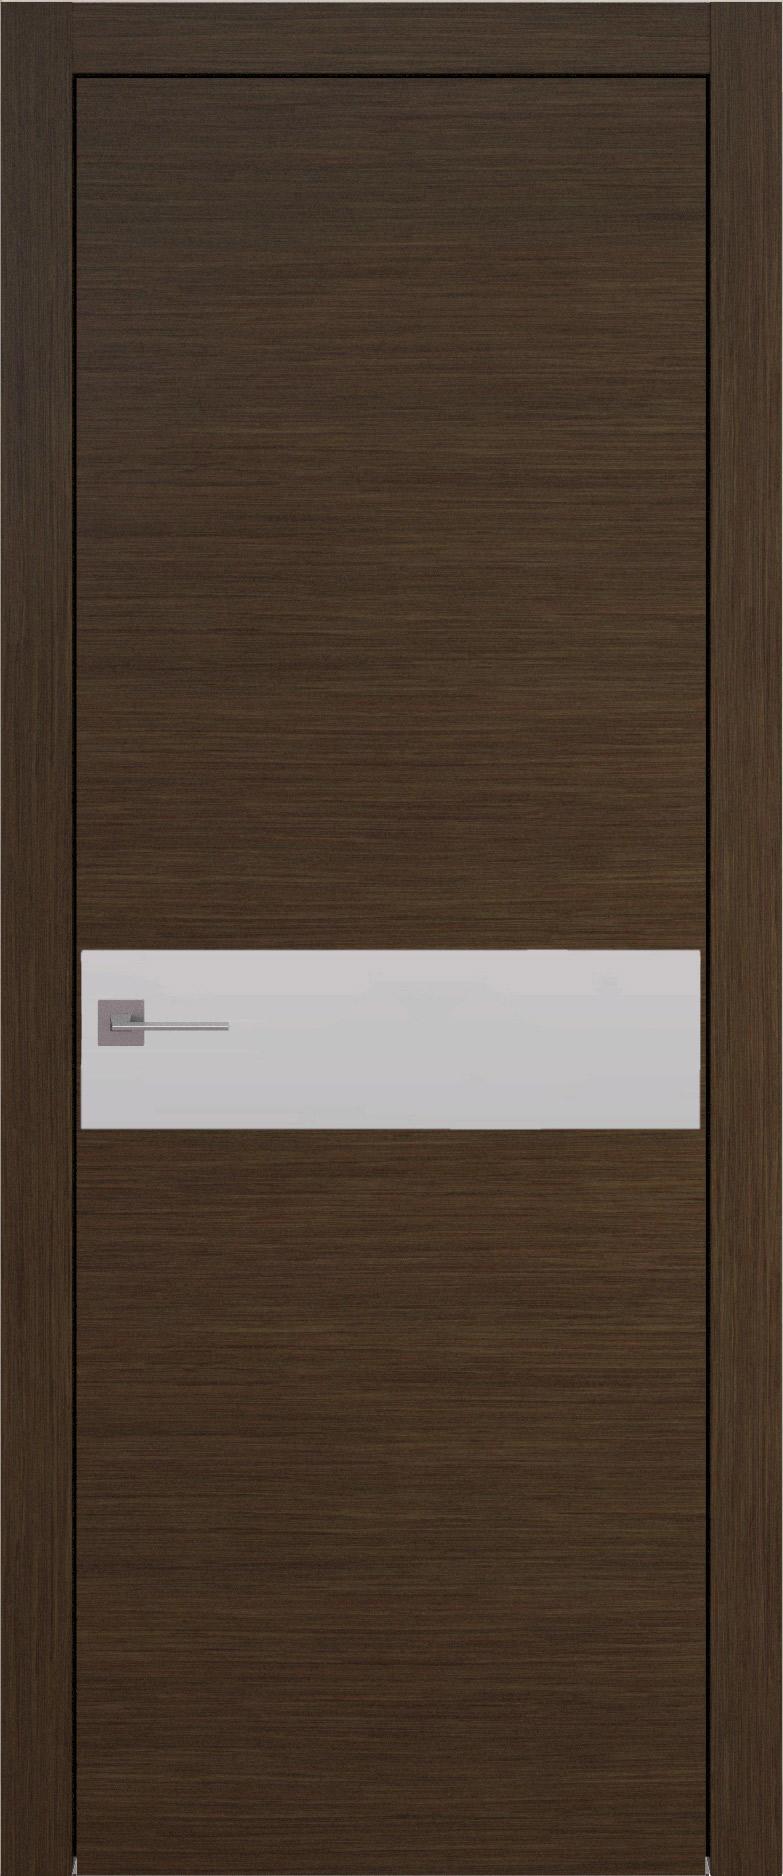 Tivoli И-4 цвет - Венге Без стекла (ДГ)